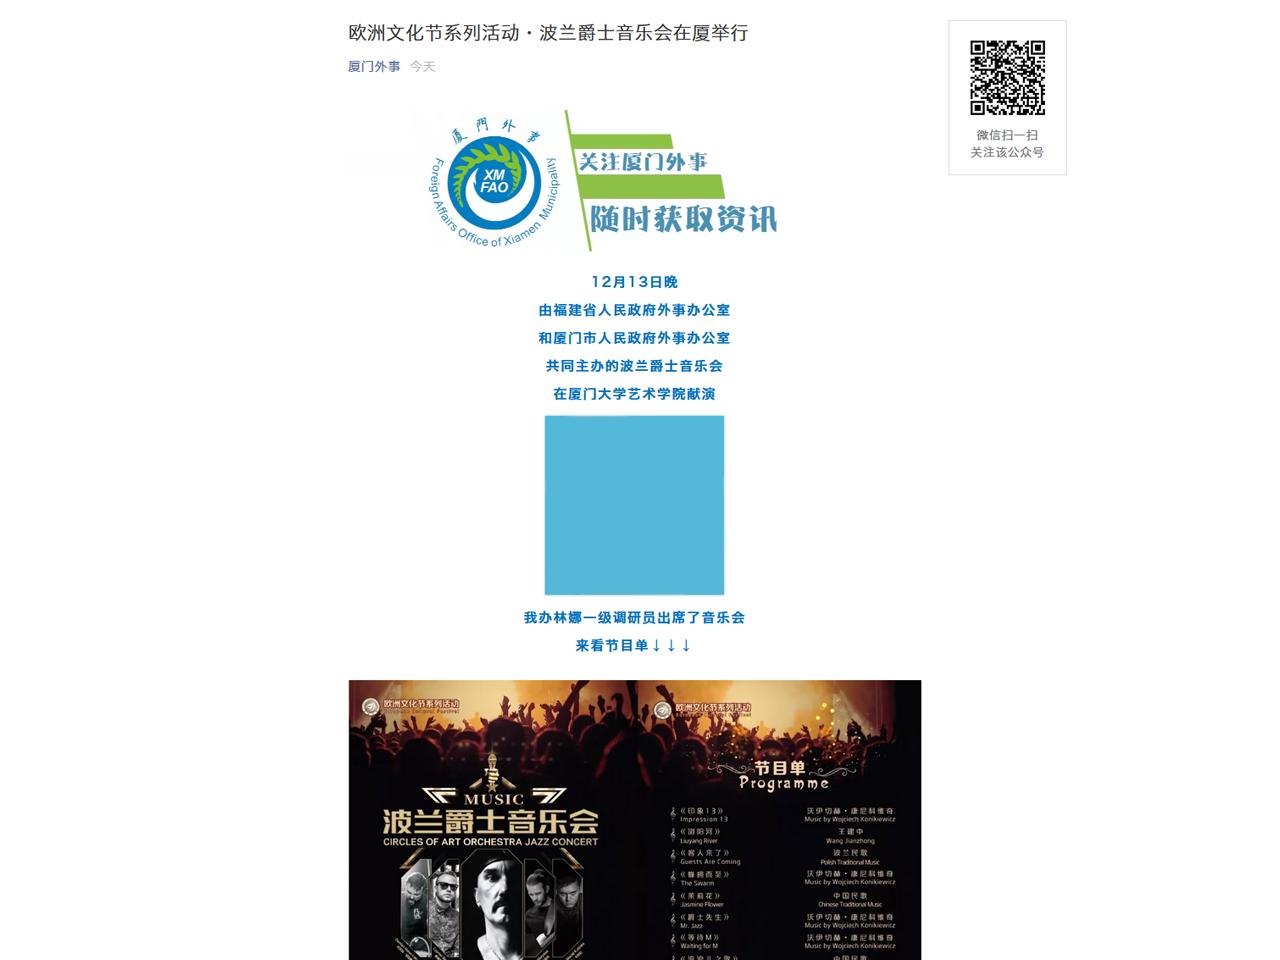 20191213_mp.weixin.qq.com